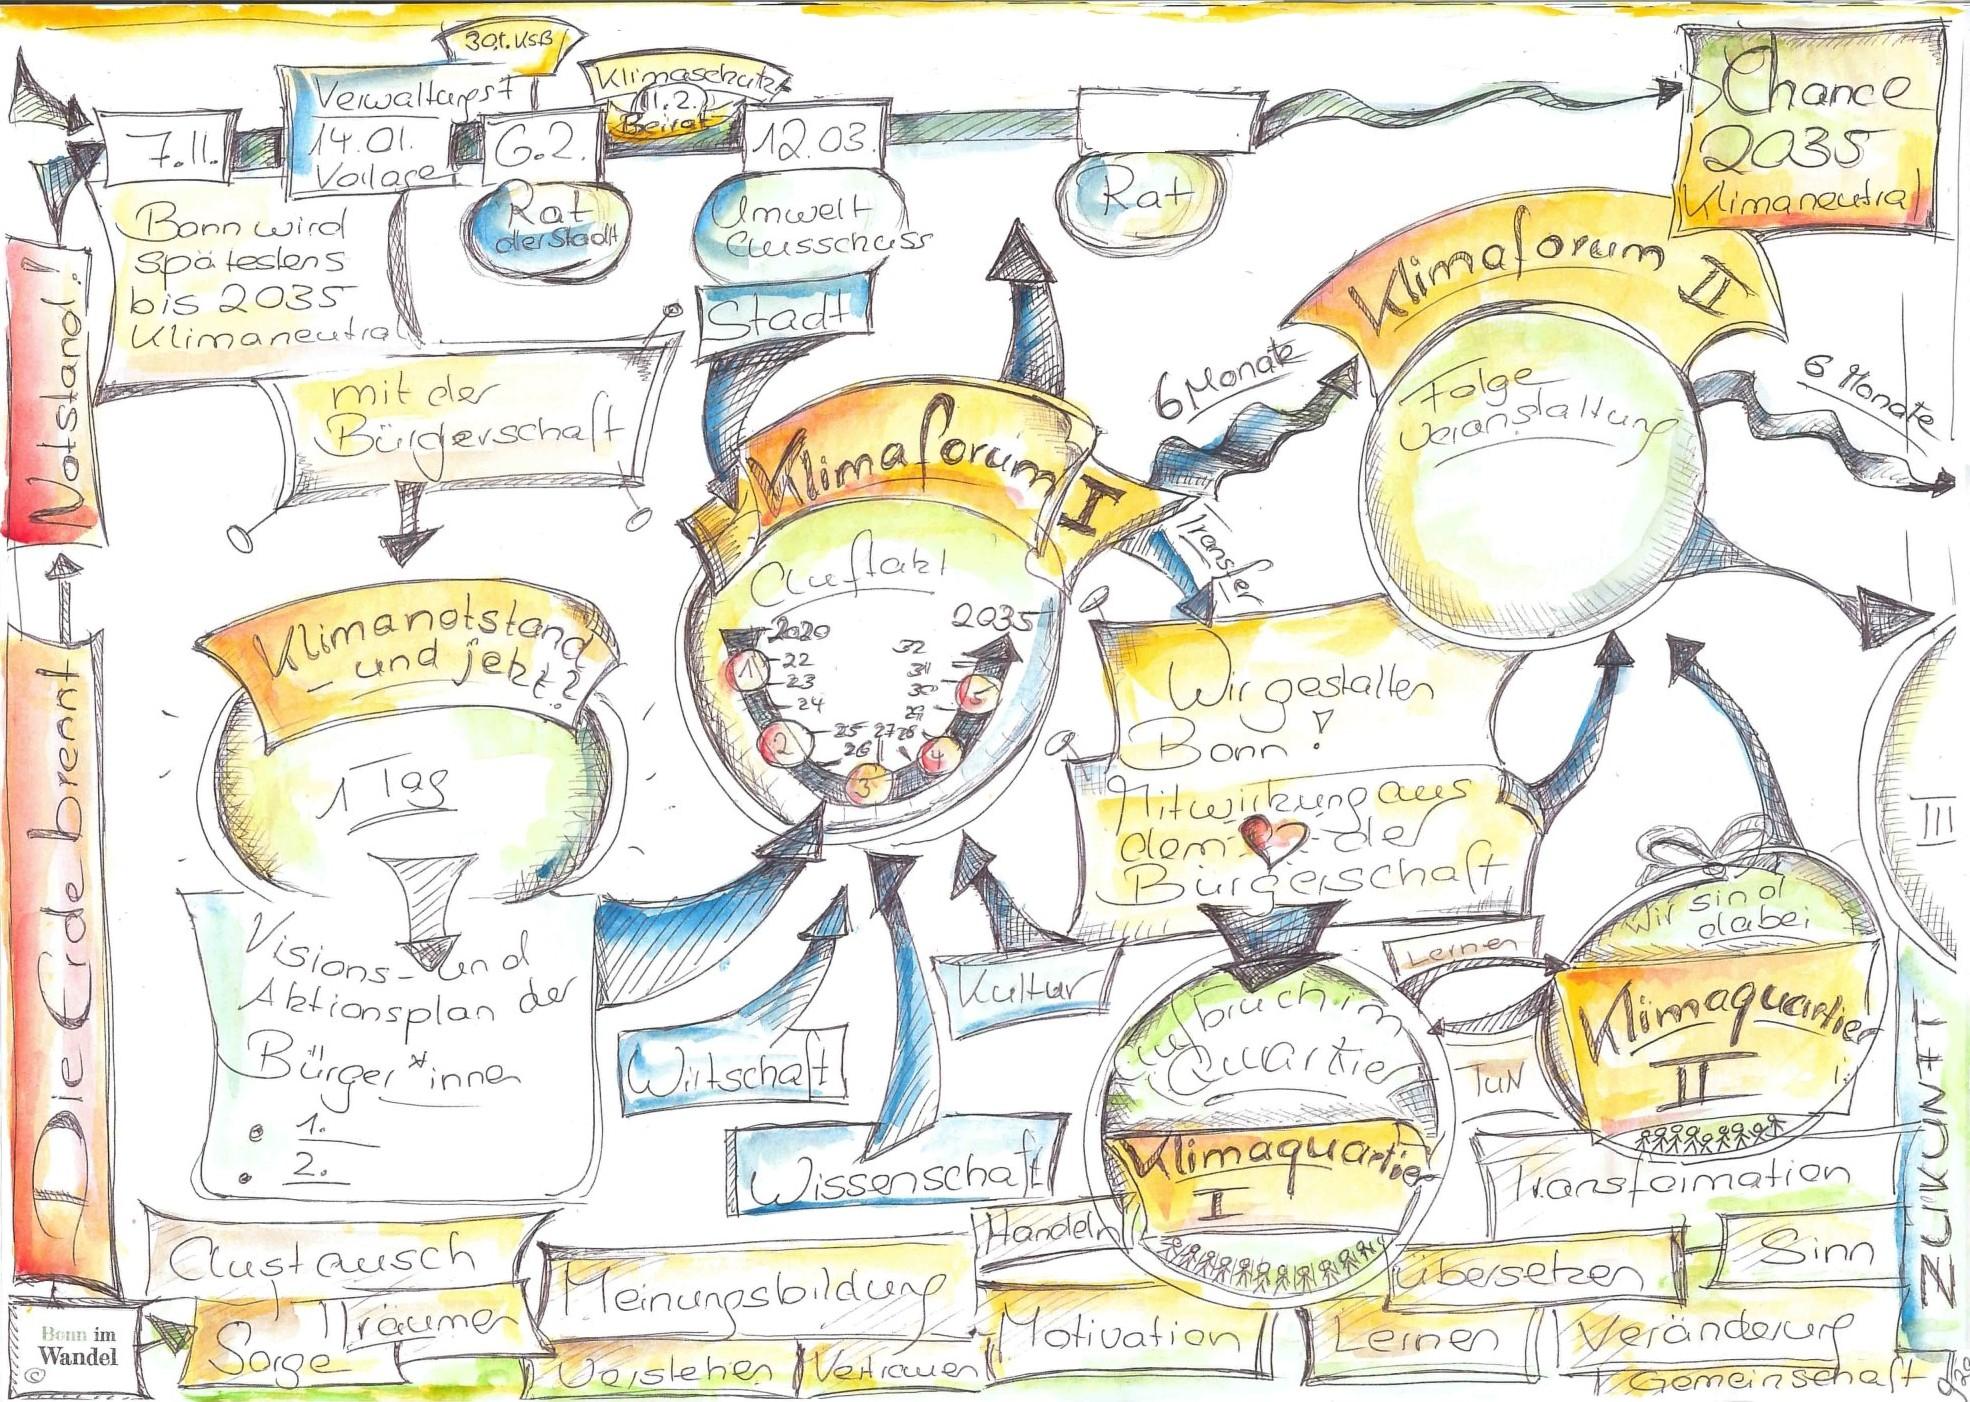 Prozessskizze Bonn4Future - Wir fürs Klima